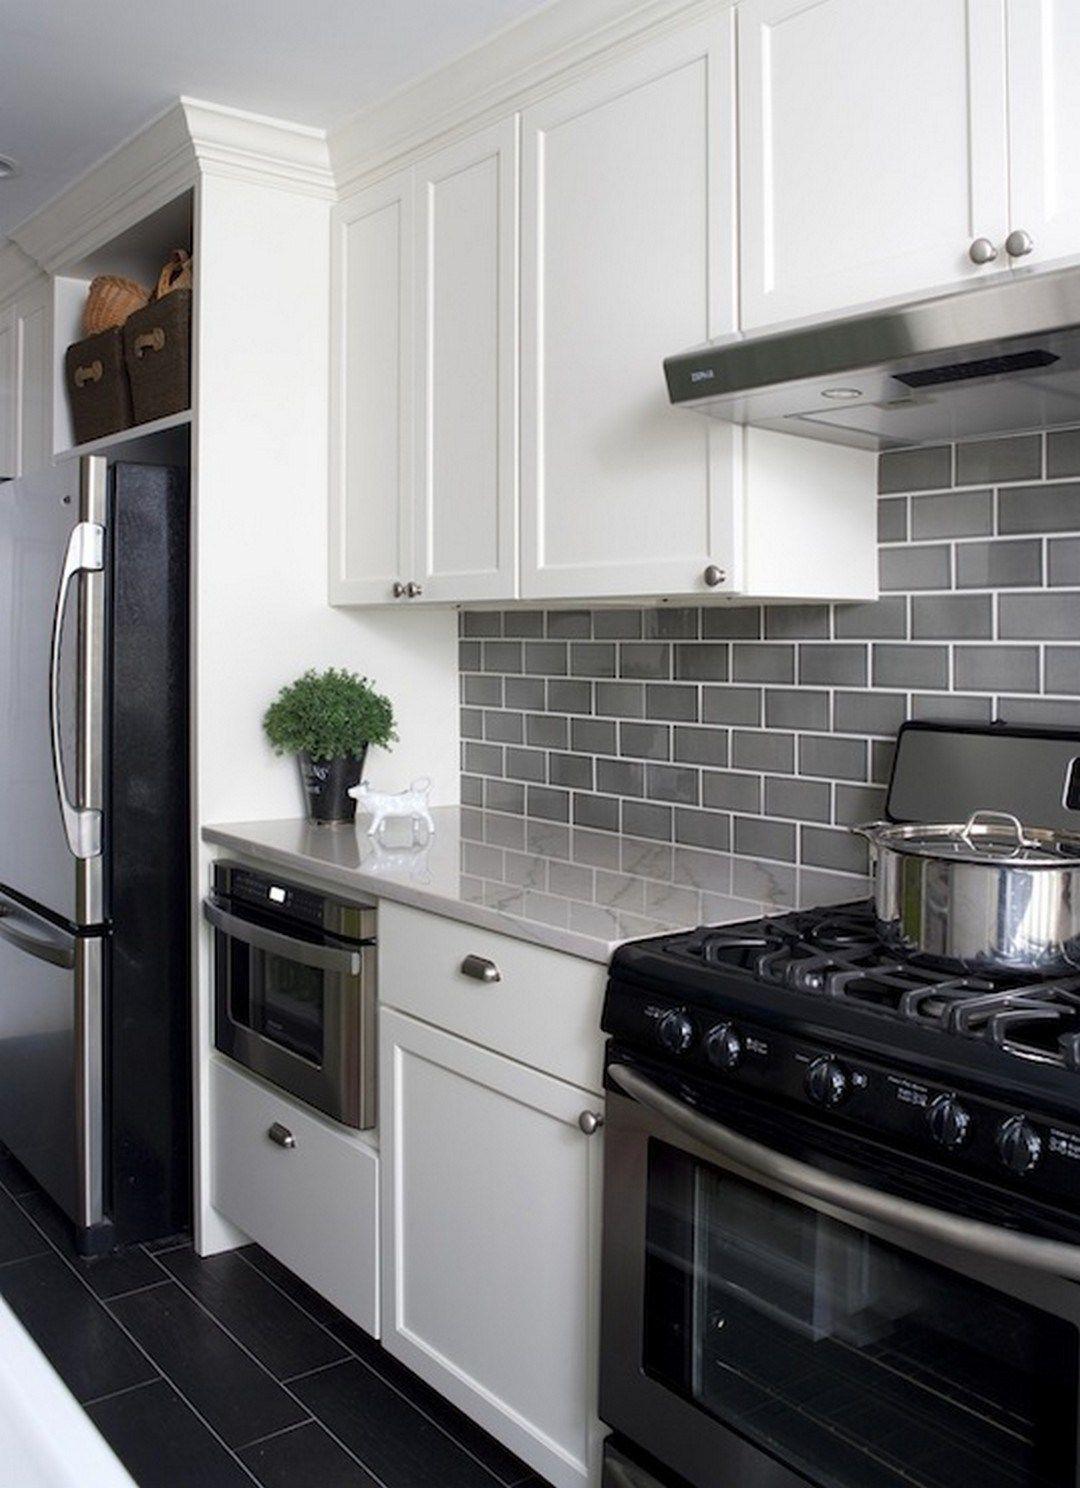 99 Elegant Subway Tile Backsplash Ideas For Your Kitchen Or Bathroom 116 Kitchen Backsplash Designs White Modern Kitchen Kitchen Inspirations